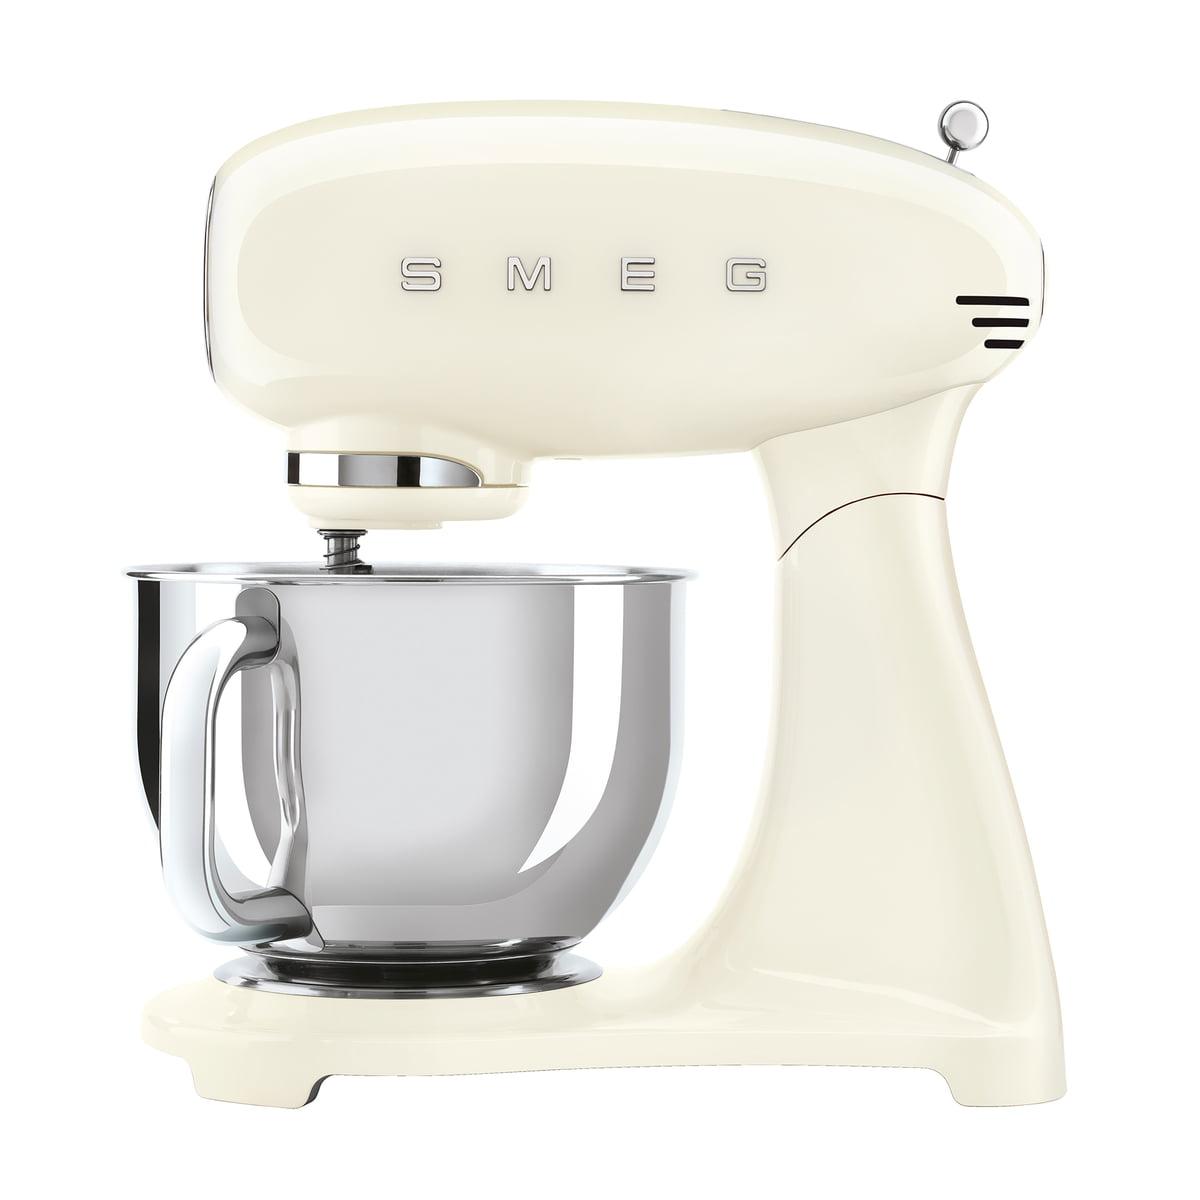 SMEG - Küchenmaschine SMF03, creme